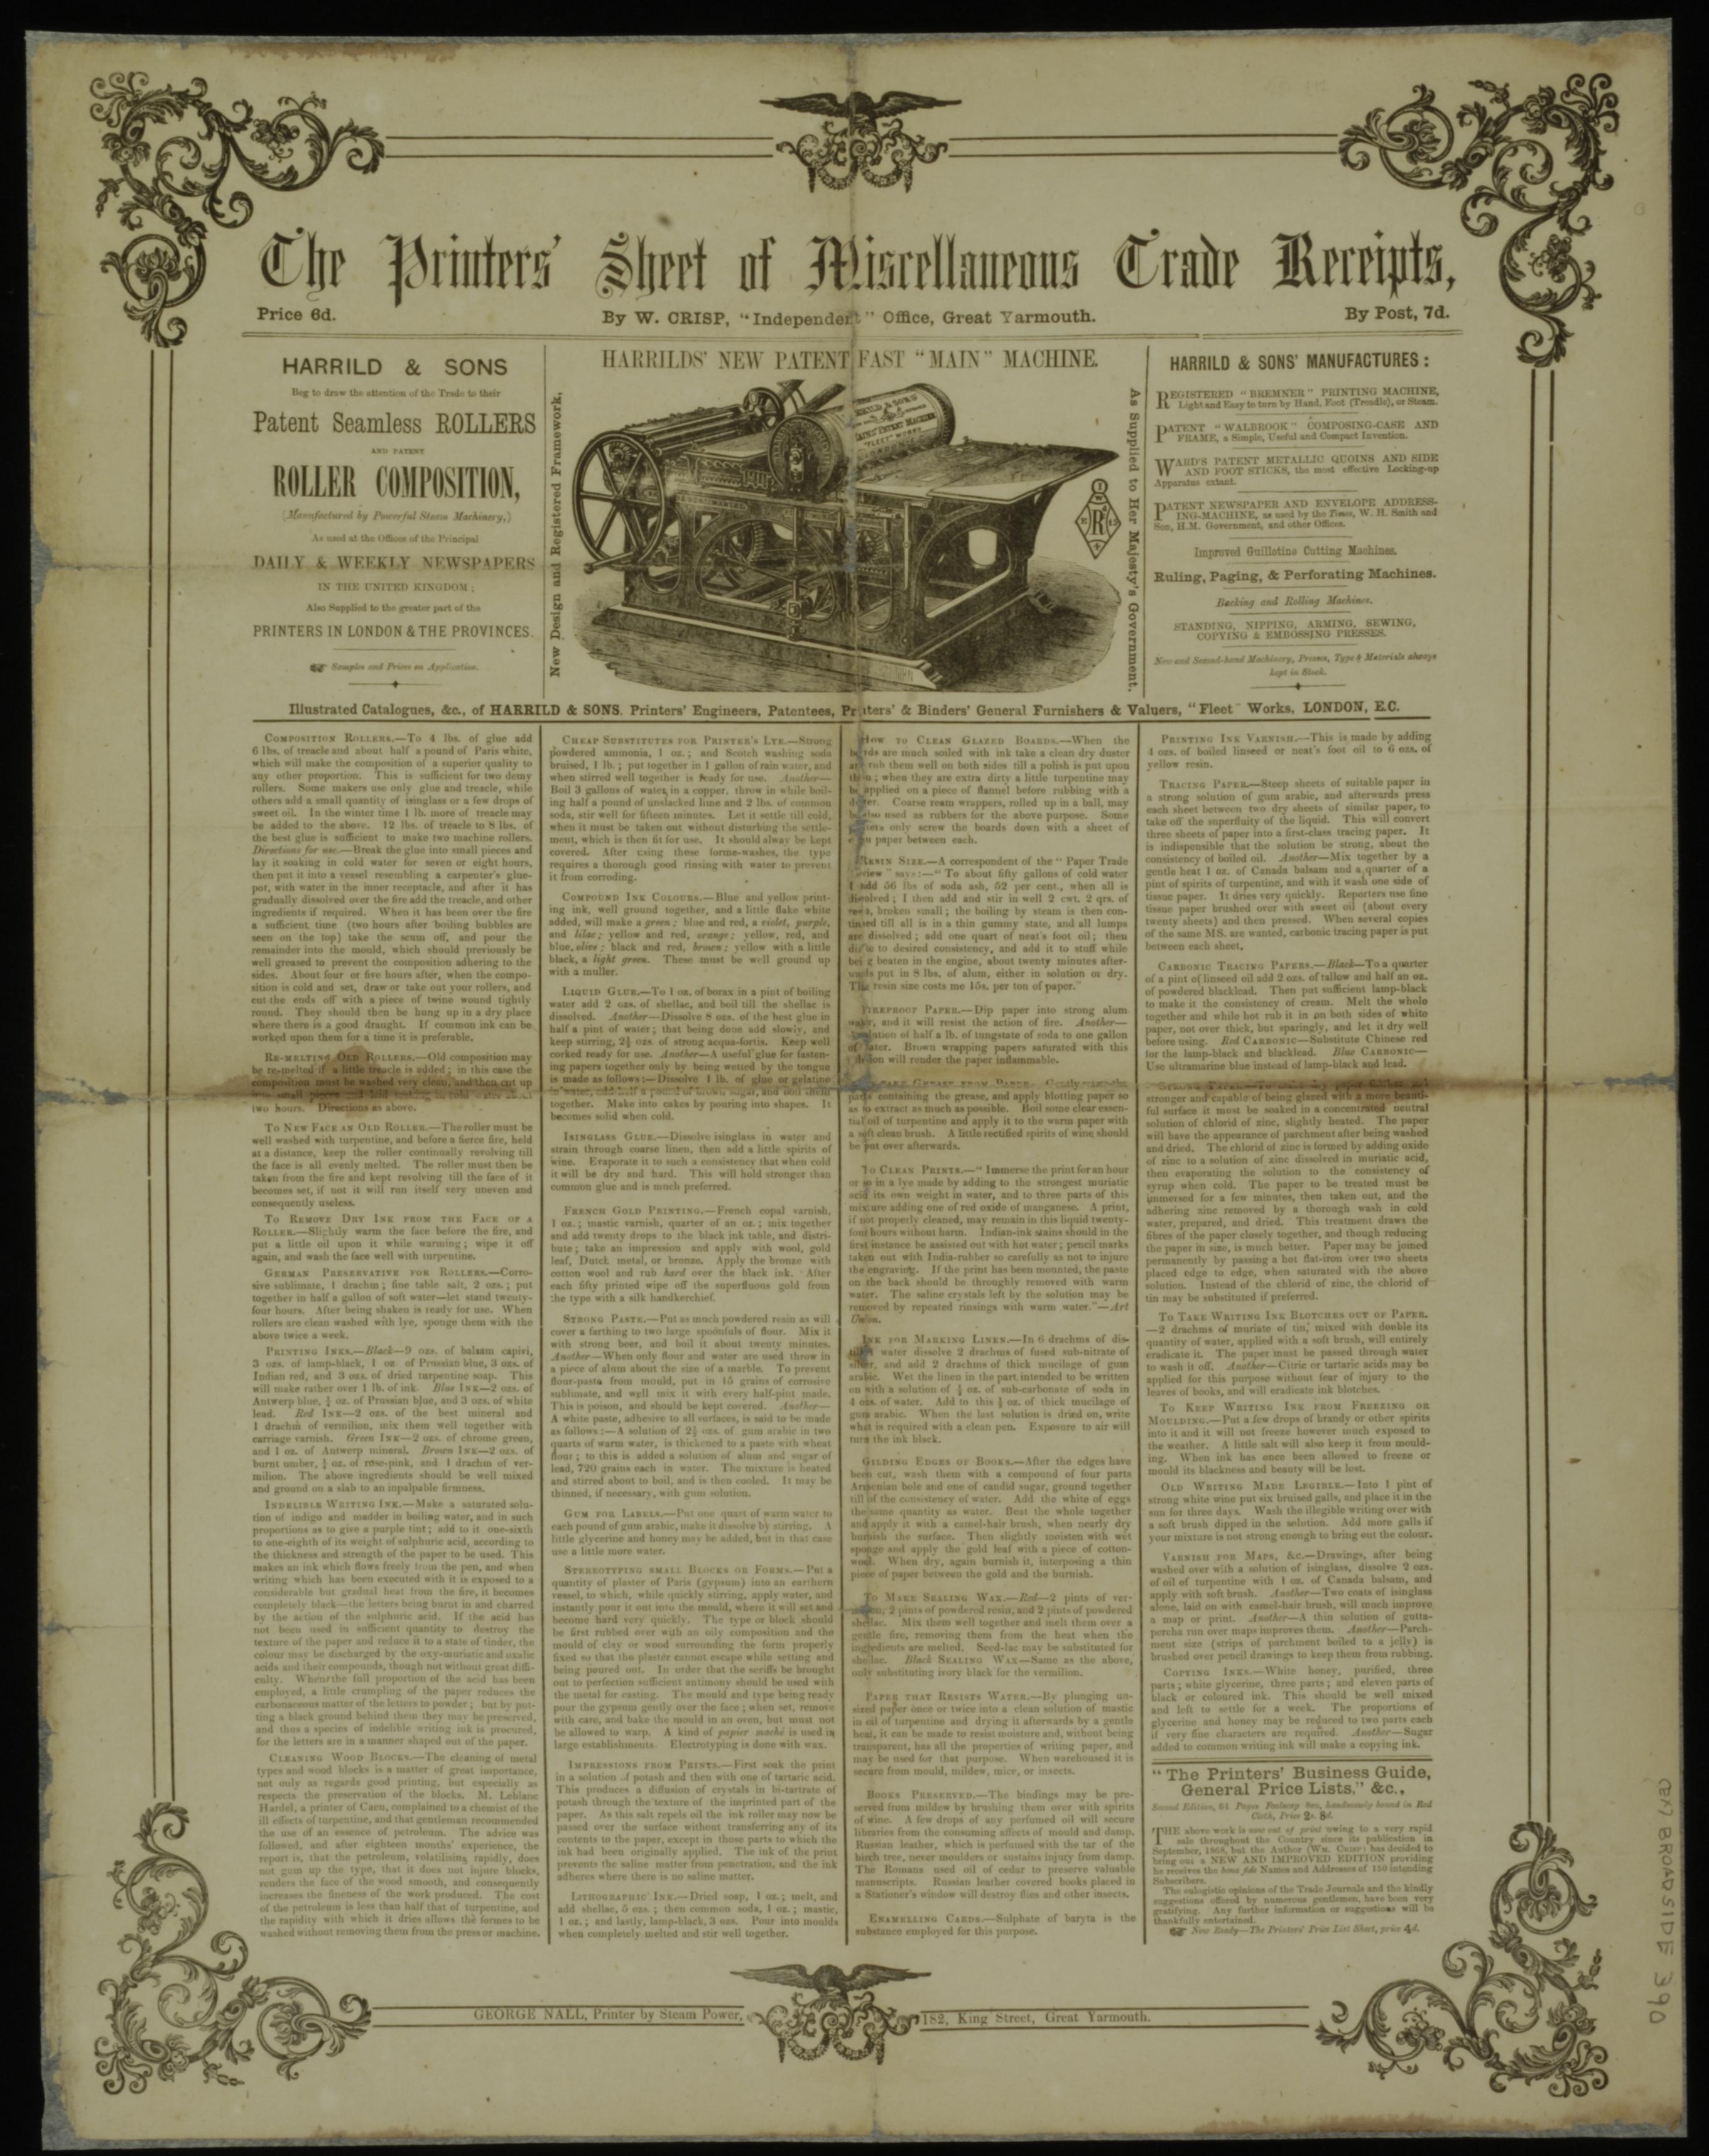 W. Crisp, The Printers' Sheet of  Miscellaneous Trade Receipts  (187-) — (Ex) Broadside 390